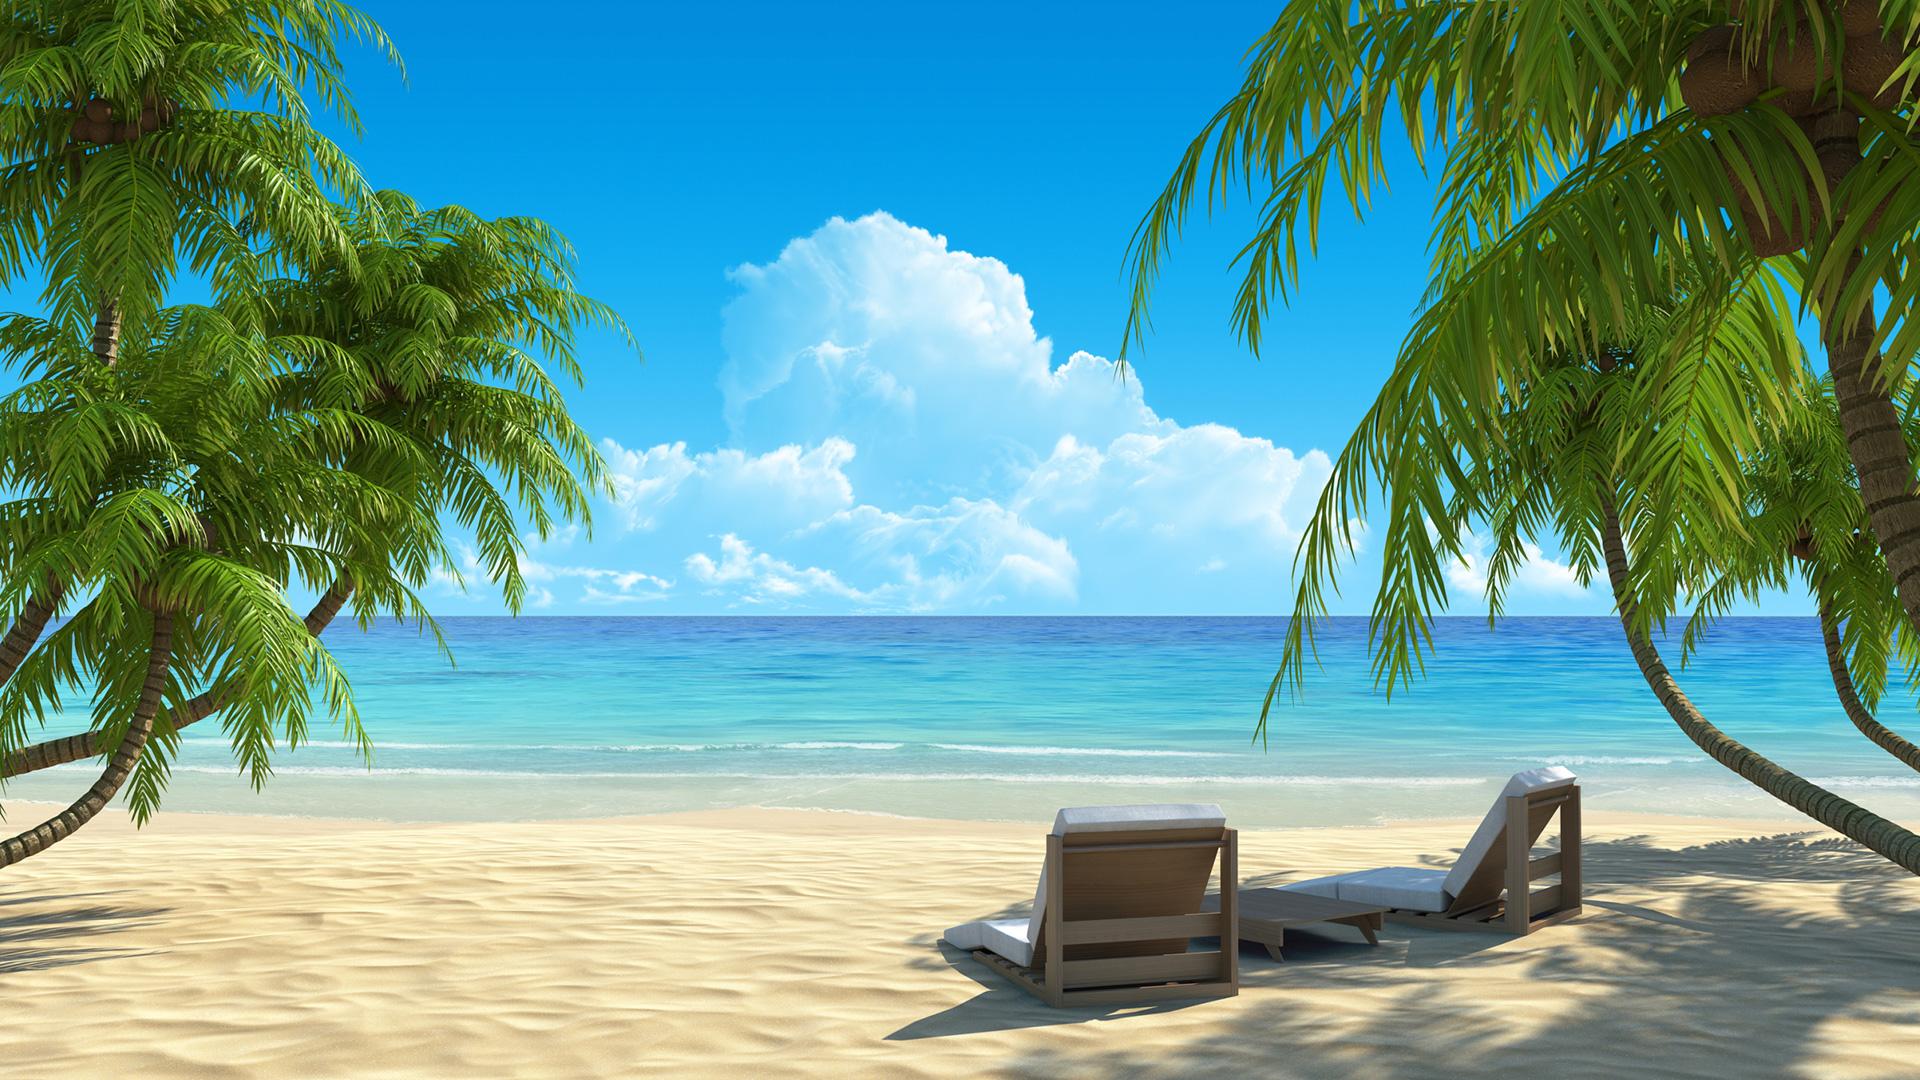 Tropical Paradise Wallpaper High Resolution: Beach Paradise Wallpaper